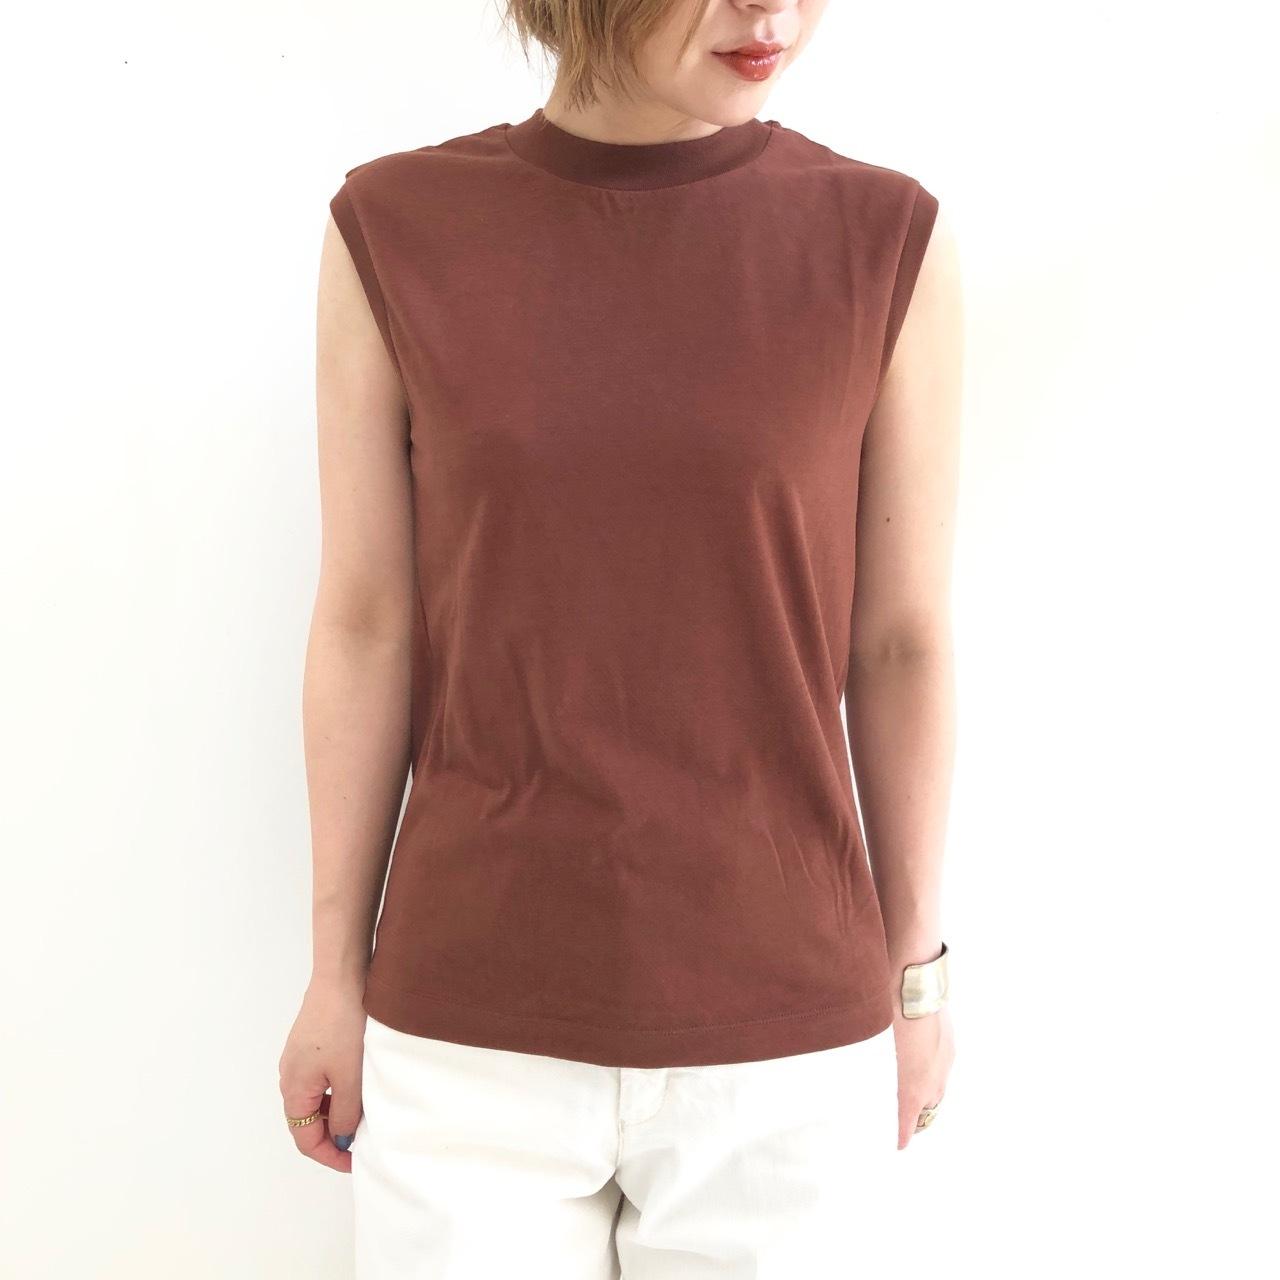 -RESTOCK-【 Luvourdays 】- LV-CT9229 - ノースリーブTeeシャツ